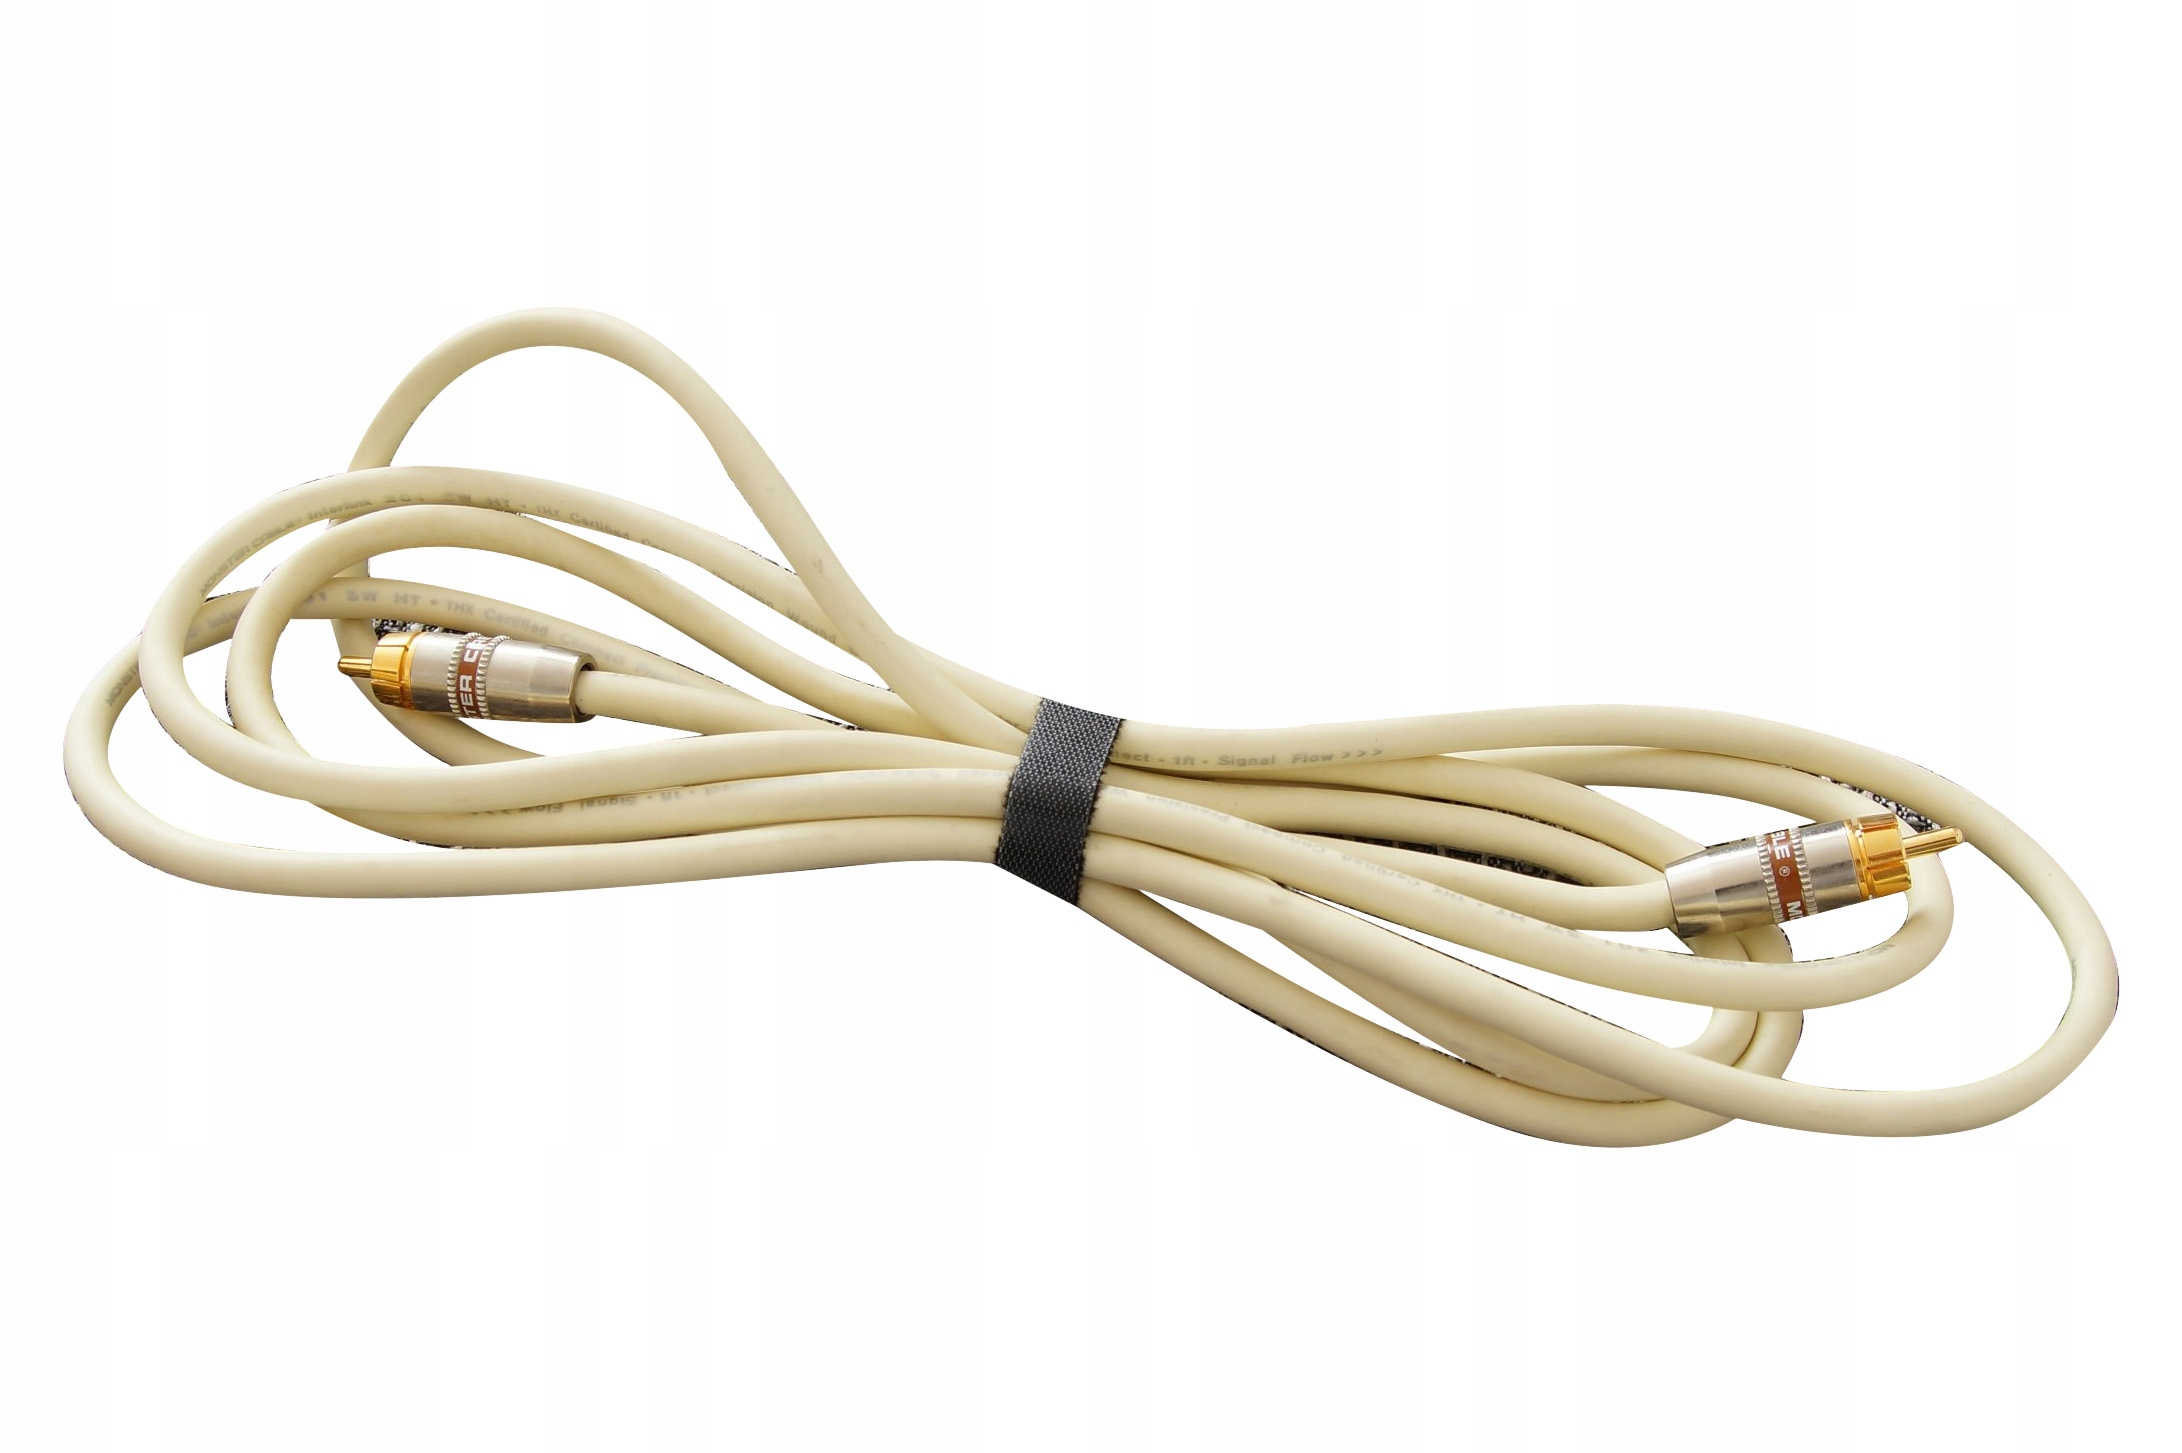 Przewód do Subwoofera Monster Cable THX 201SW 2.5m